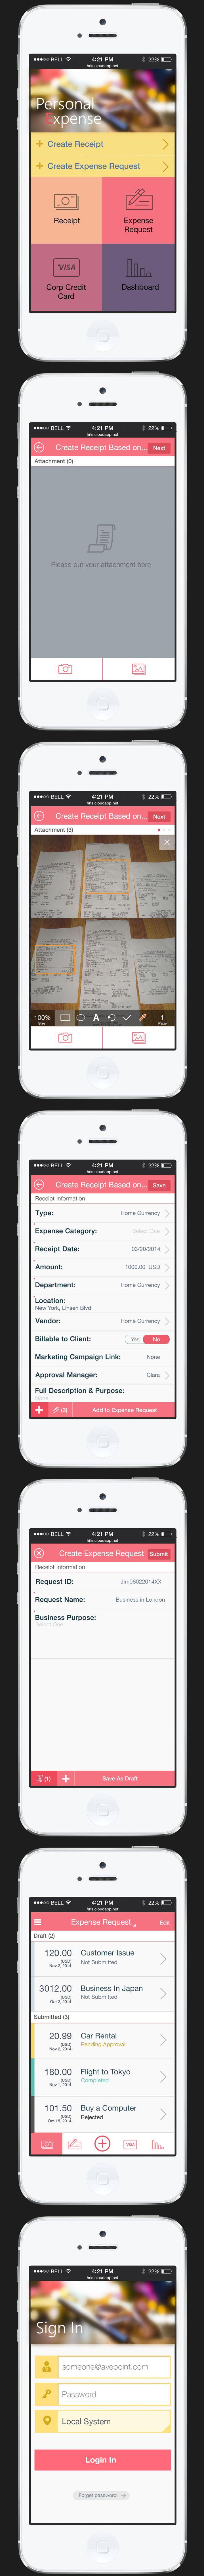 Ada's Mobile Design - Expense App